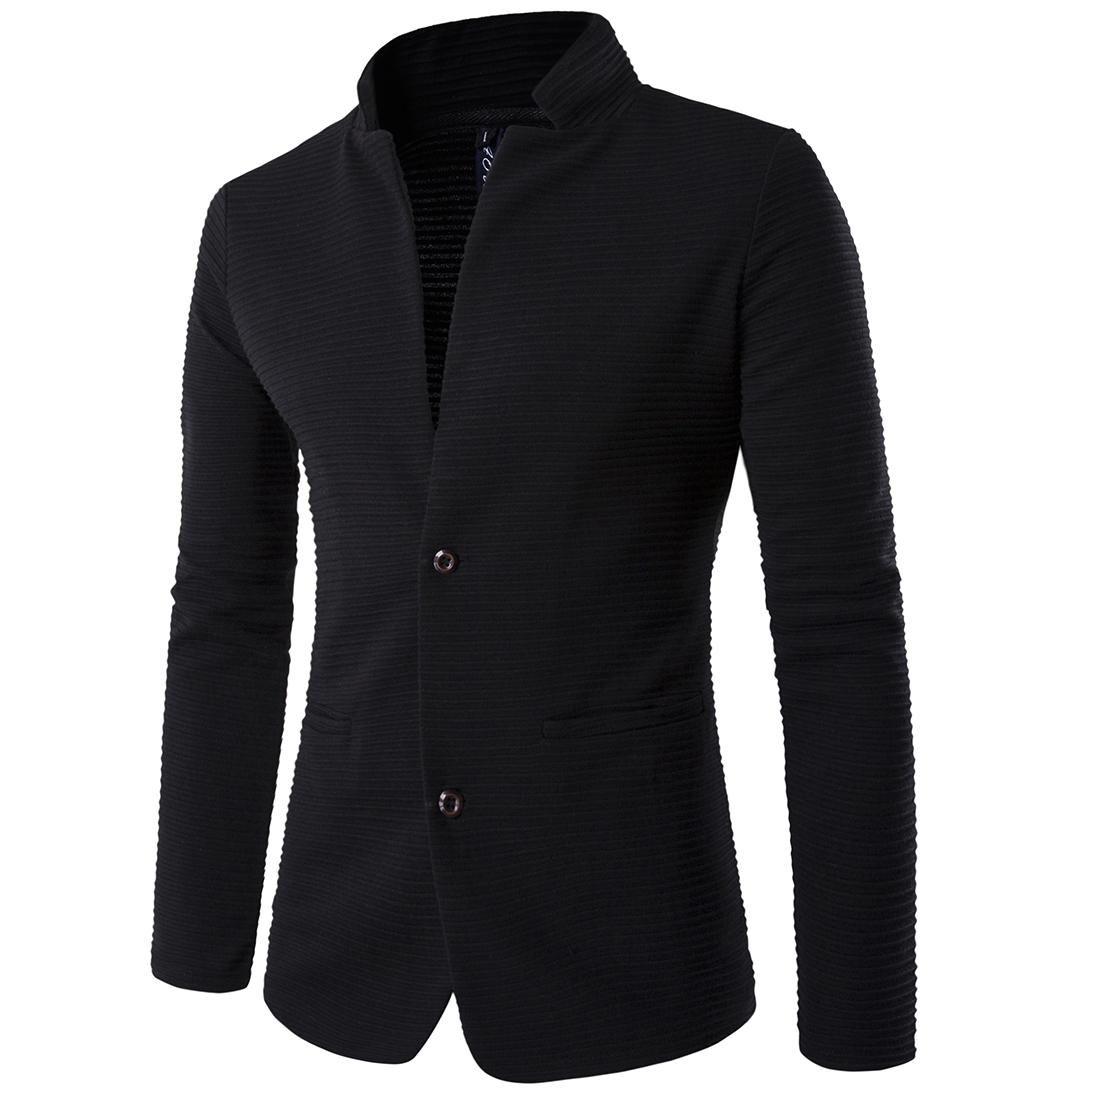 3ba904cb5cbd5 New Slim Business Blazer Jacket Man Patchwork Long Sleeve Plus Size Mens Suit  Jacket 5XL Winter Fitness Coat Male Suite Online with  47.62 Piece on  Quhai s ...